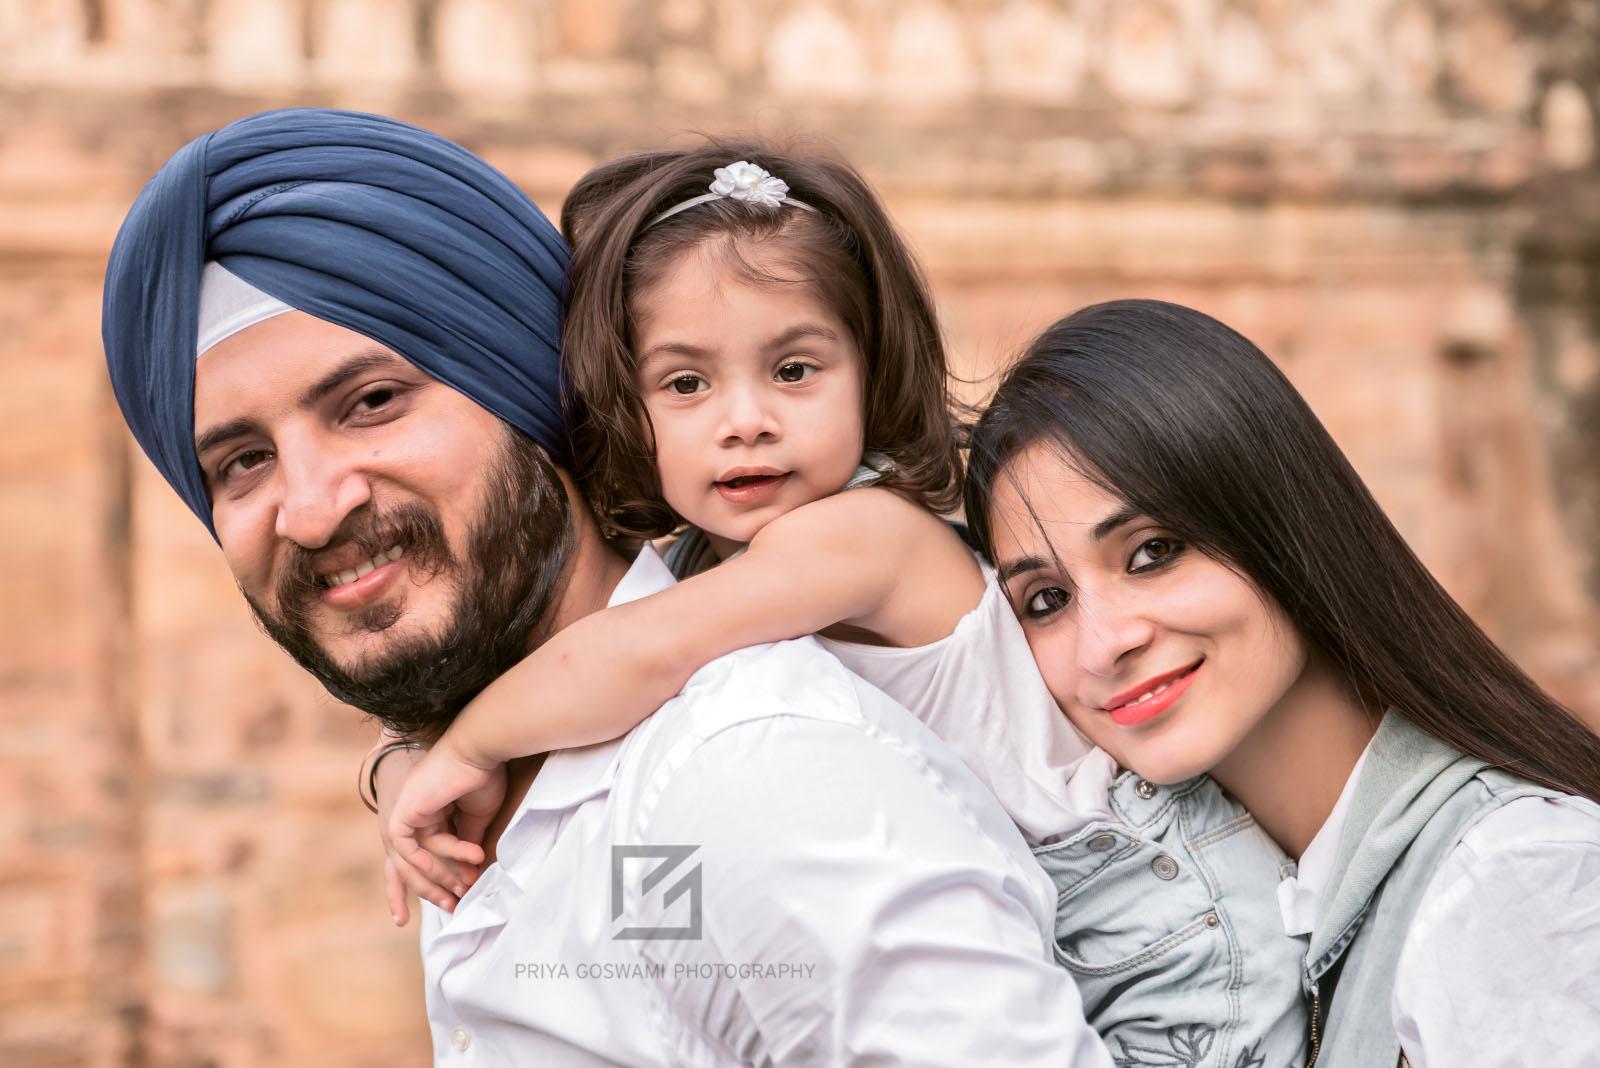 Family-Portrait-by-Priya-Goswami.jpg